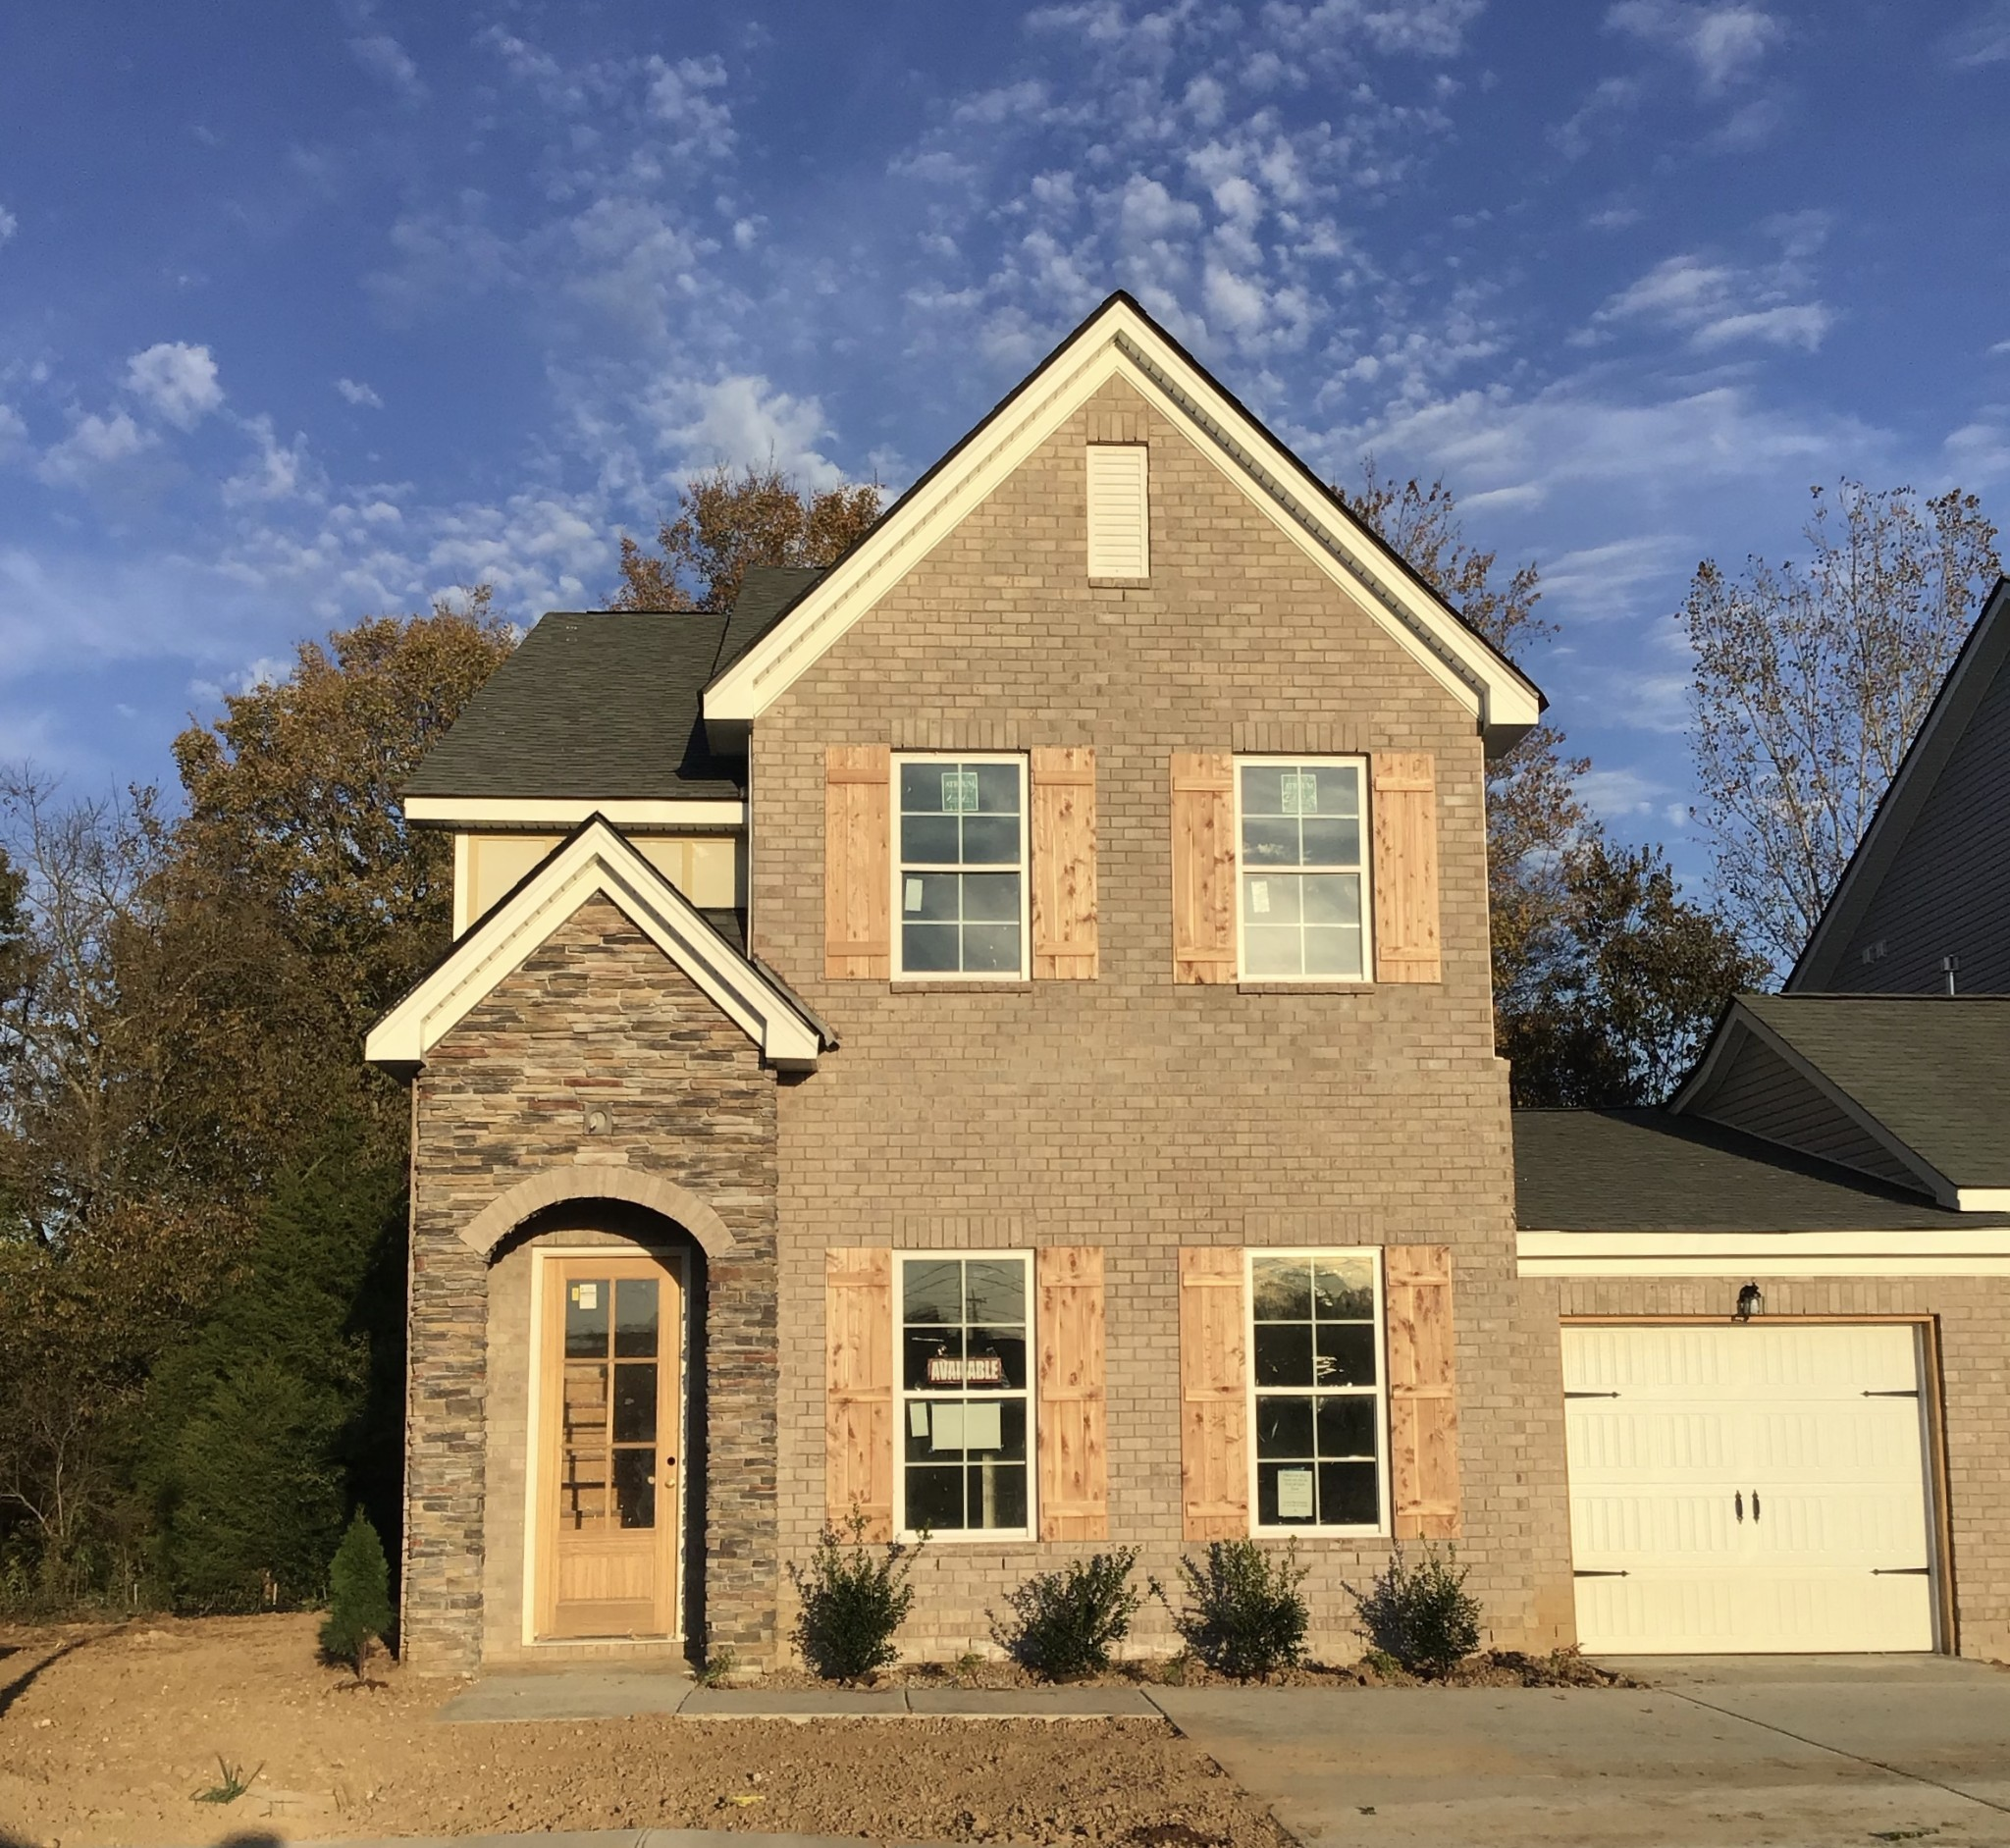 130 Bellagio Villas Dr Lot 9 Property Photo - Spring Hill, TN real estate listing